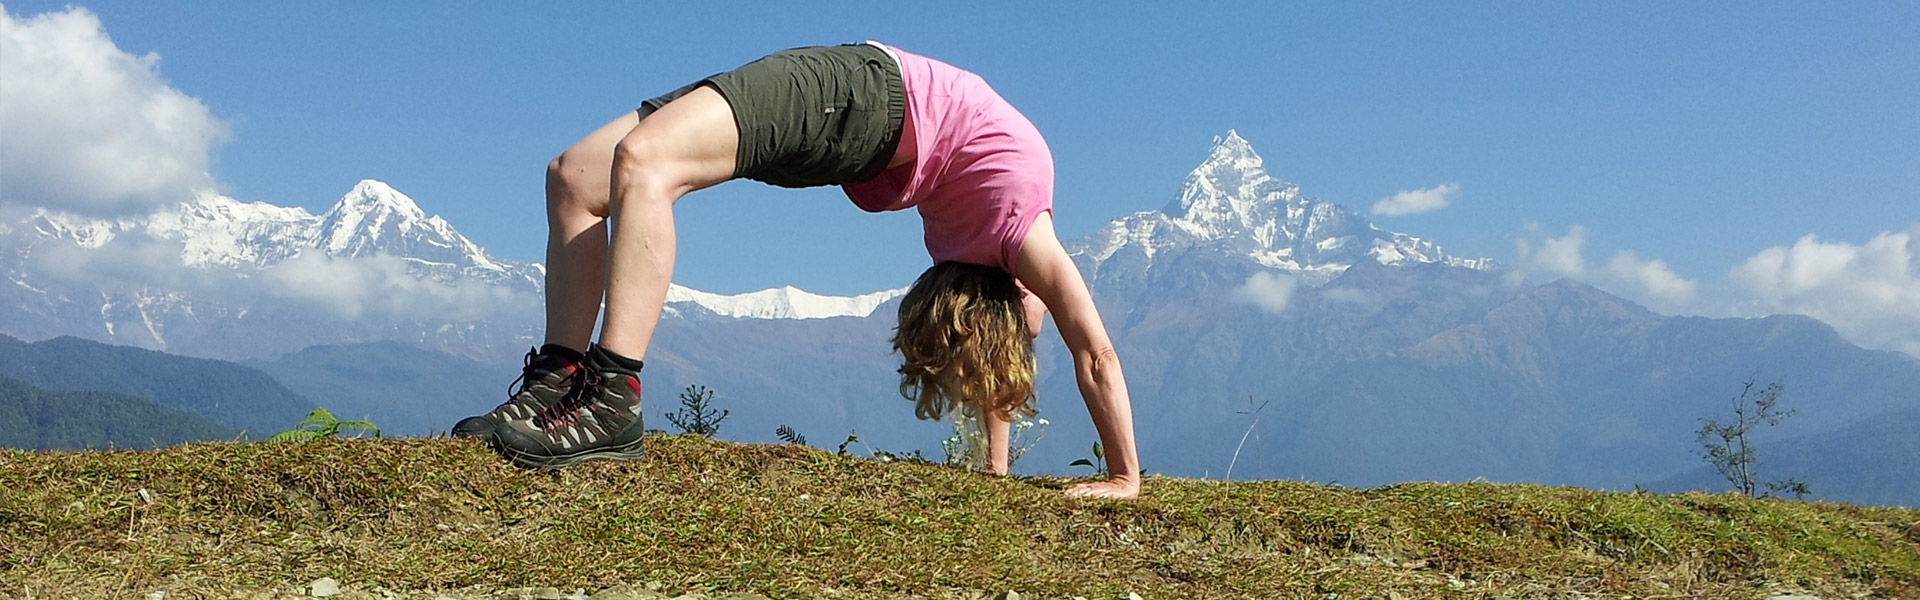 Inspirierende Einblicke Yoga, Ayurveda and Trekking in Himalaya